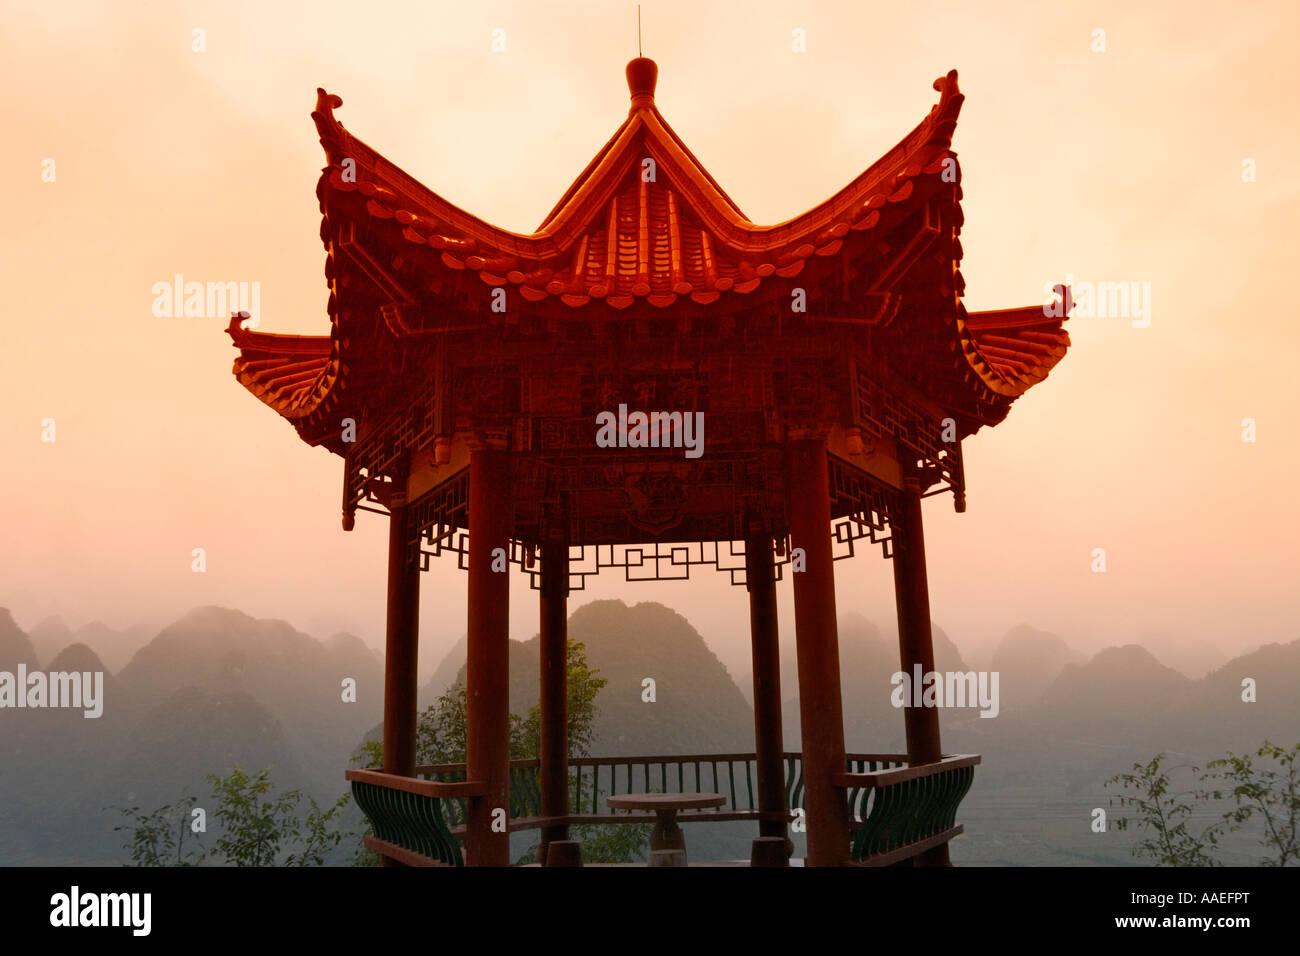 Pavilion with karst hills in mist, Thousand Peaks, Guizhou, China - Stock Image